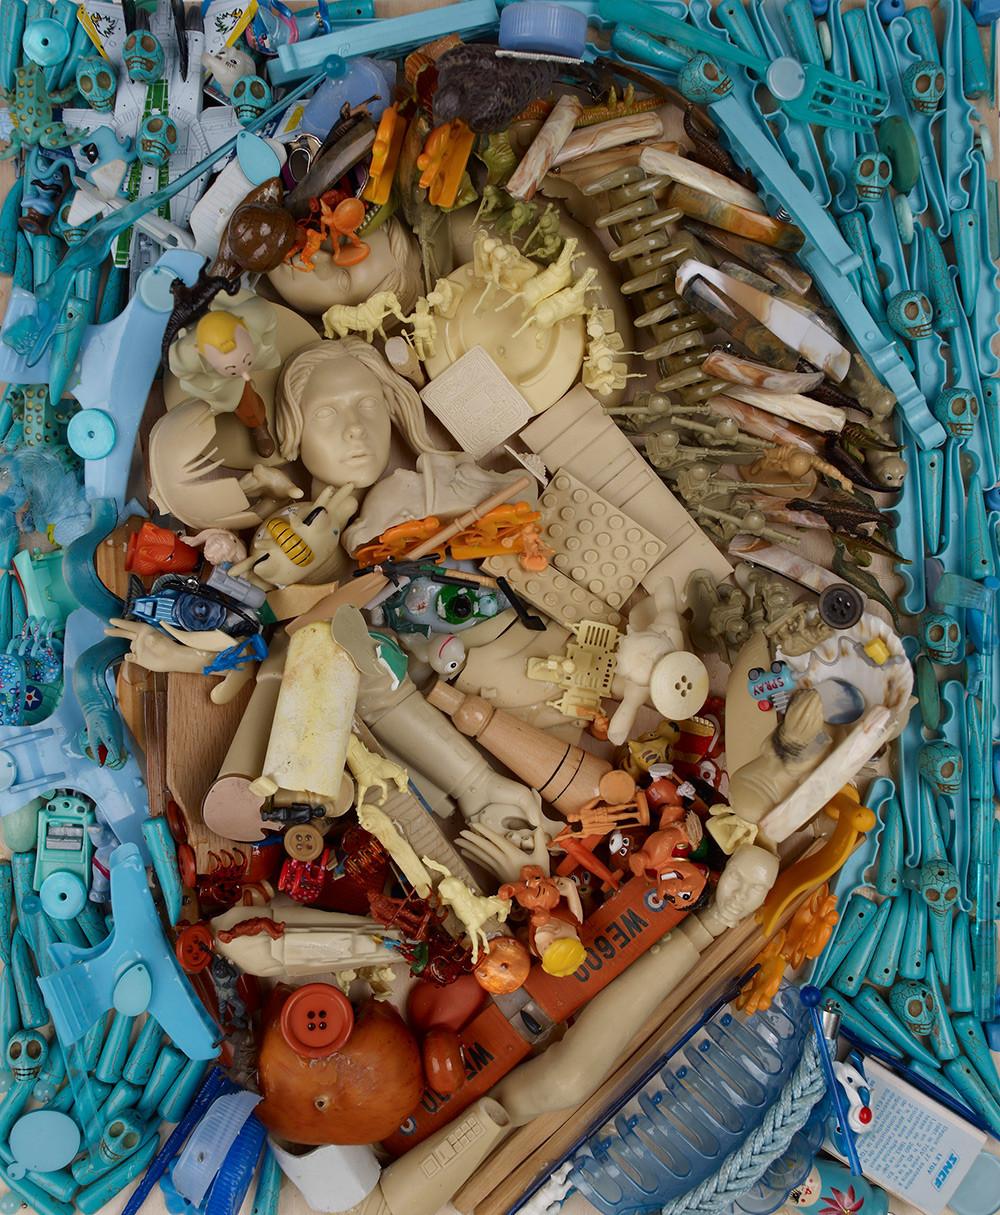 Bernard Pras - Vincent van Gogh